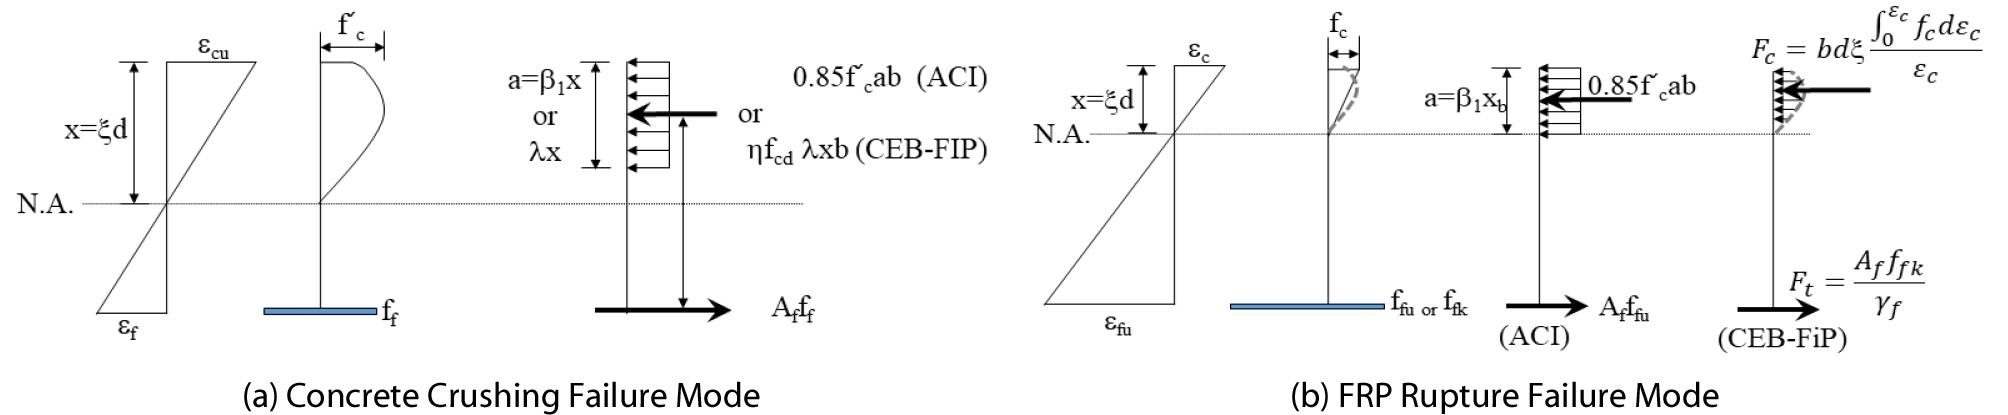 http://static.apub.kr/journalsite/sites/ksce/2020-040-04/N0110400403/images/Figure_KSCE_40_04_03_F2.jpg